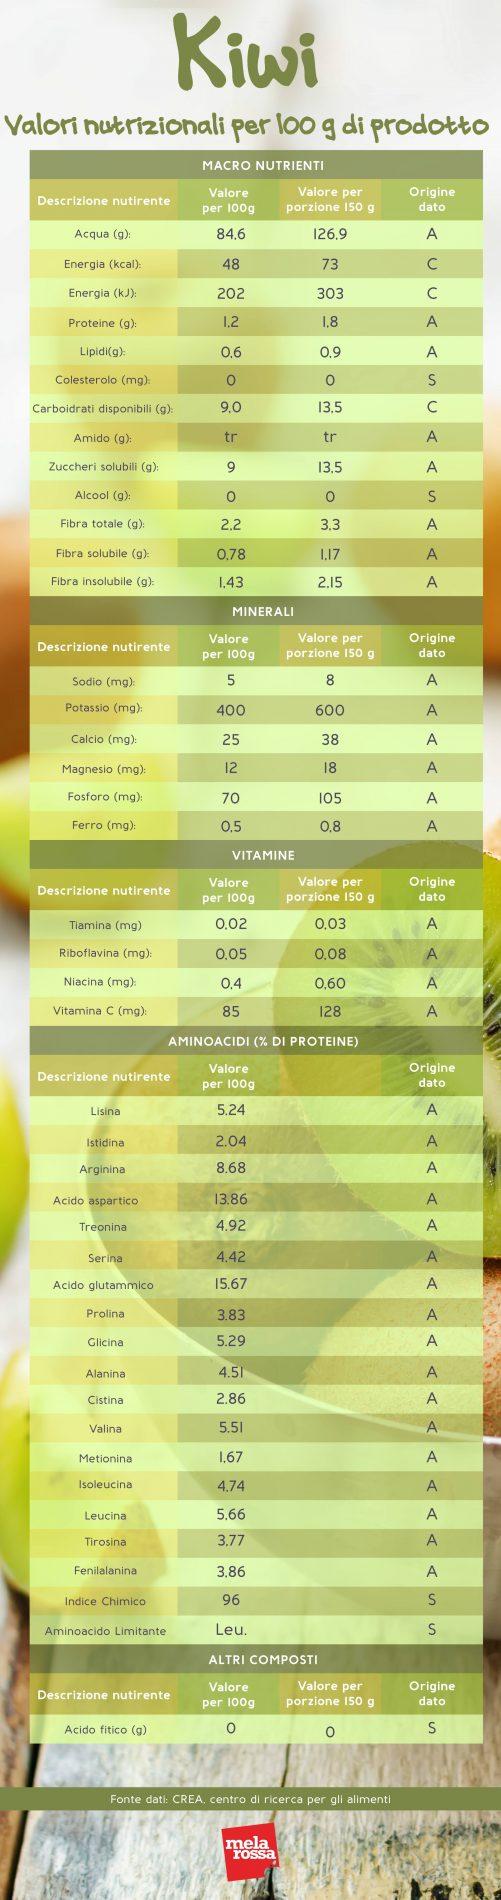 kiwi: valori nutrizionali